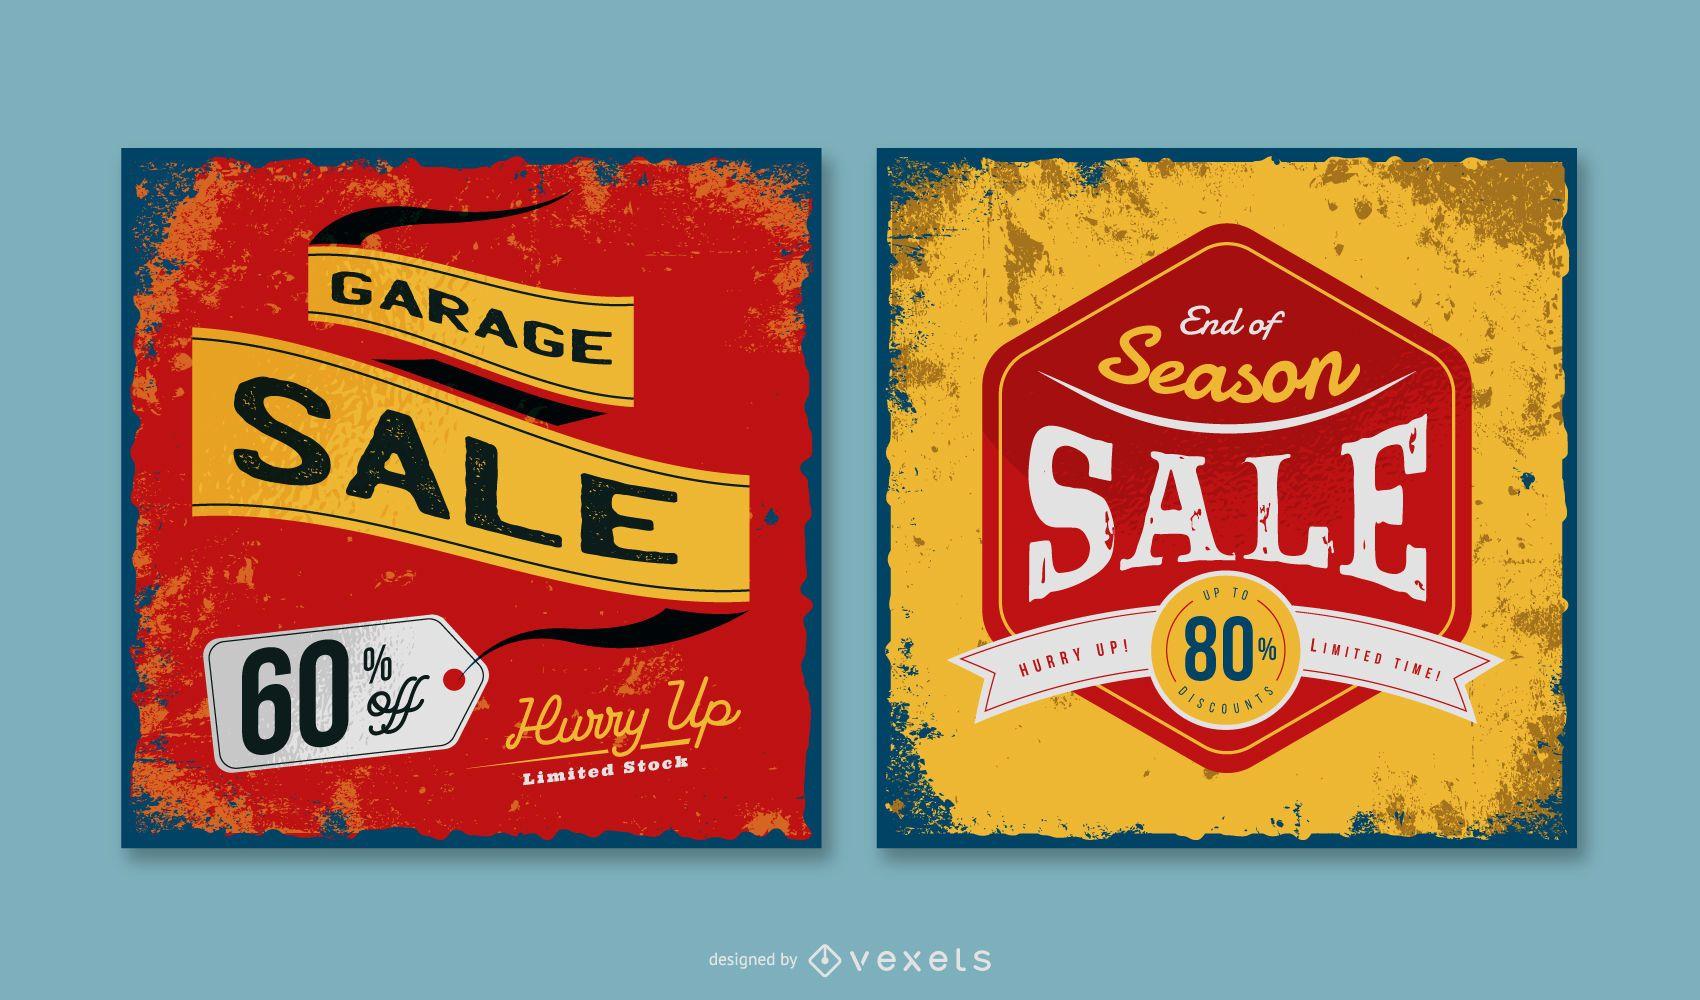 Pacote de banners vintage para venda de garagem